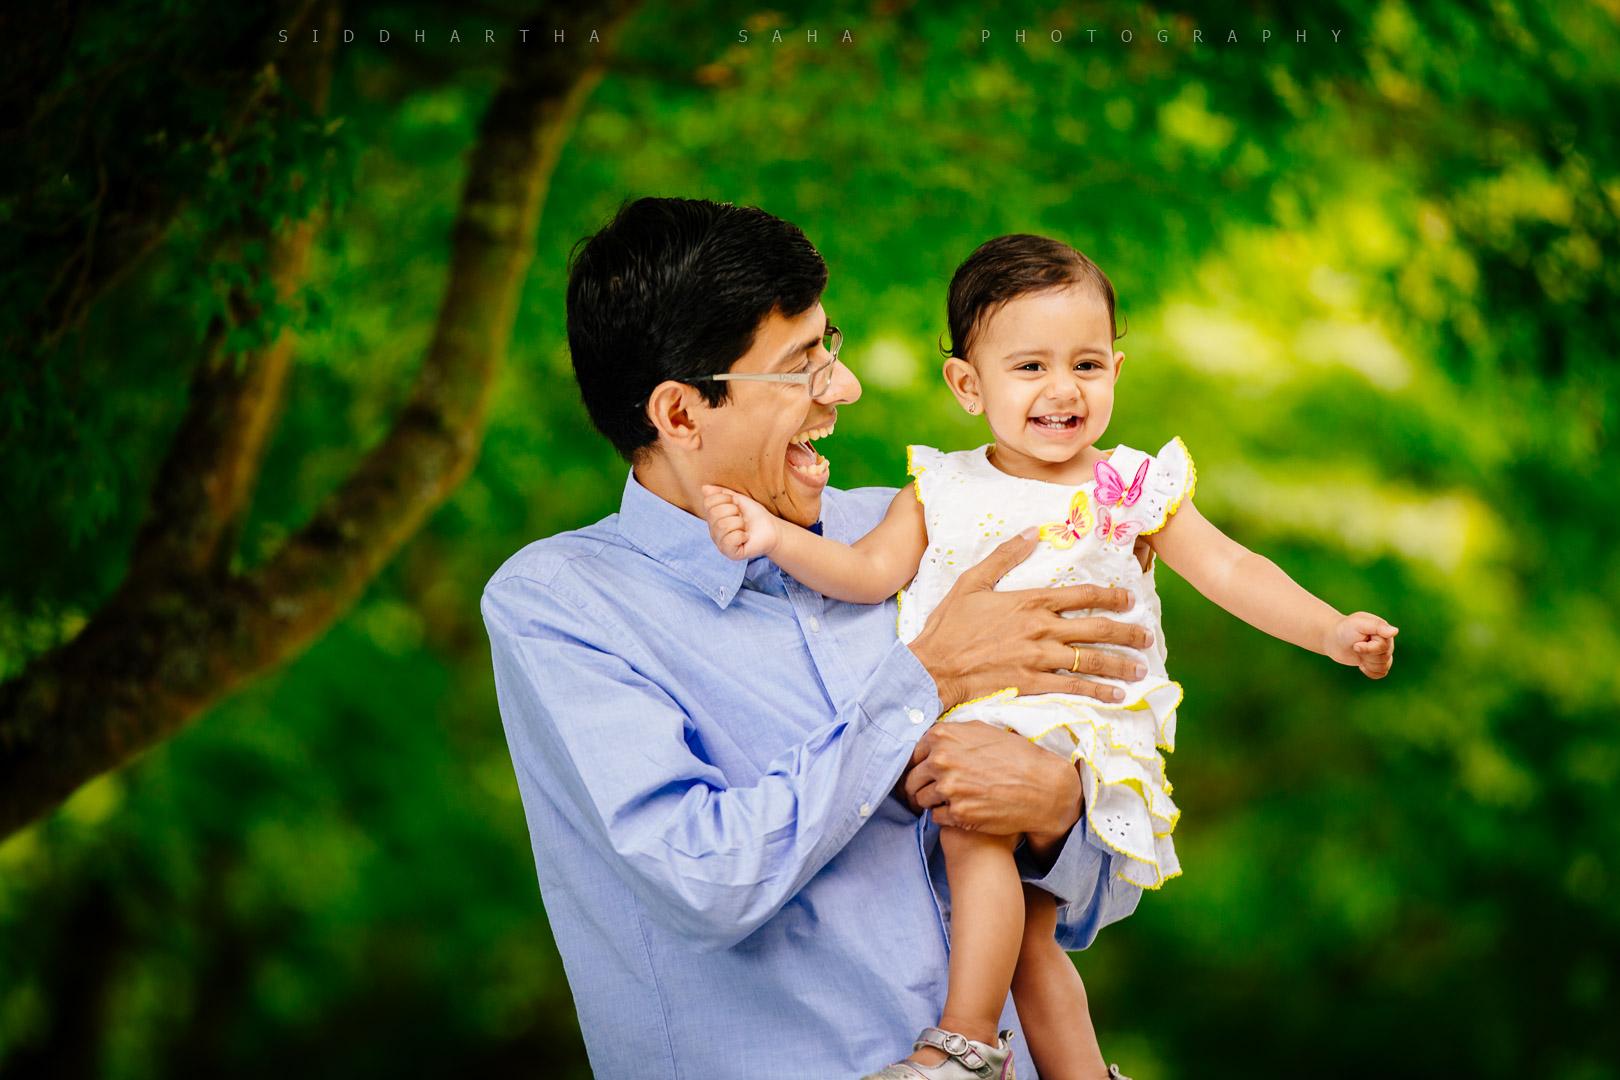 2015-08-08 - Padmaja Ketan Family Photoshoot - _05Y8593